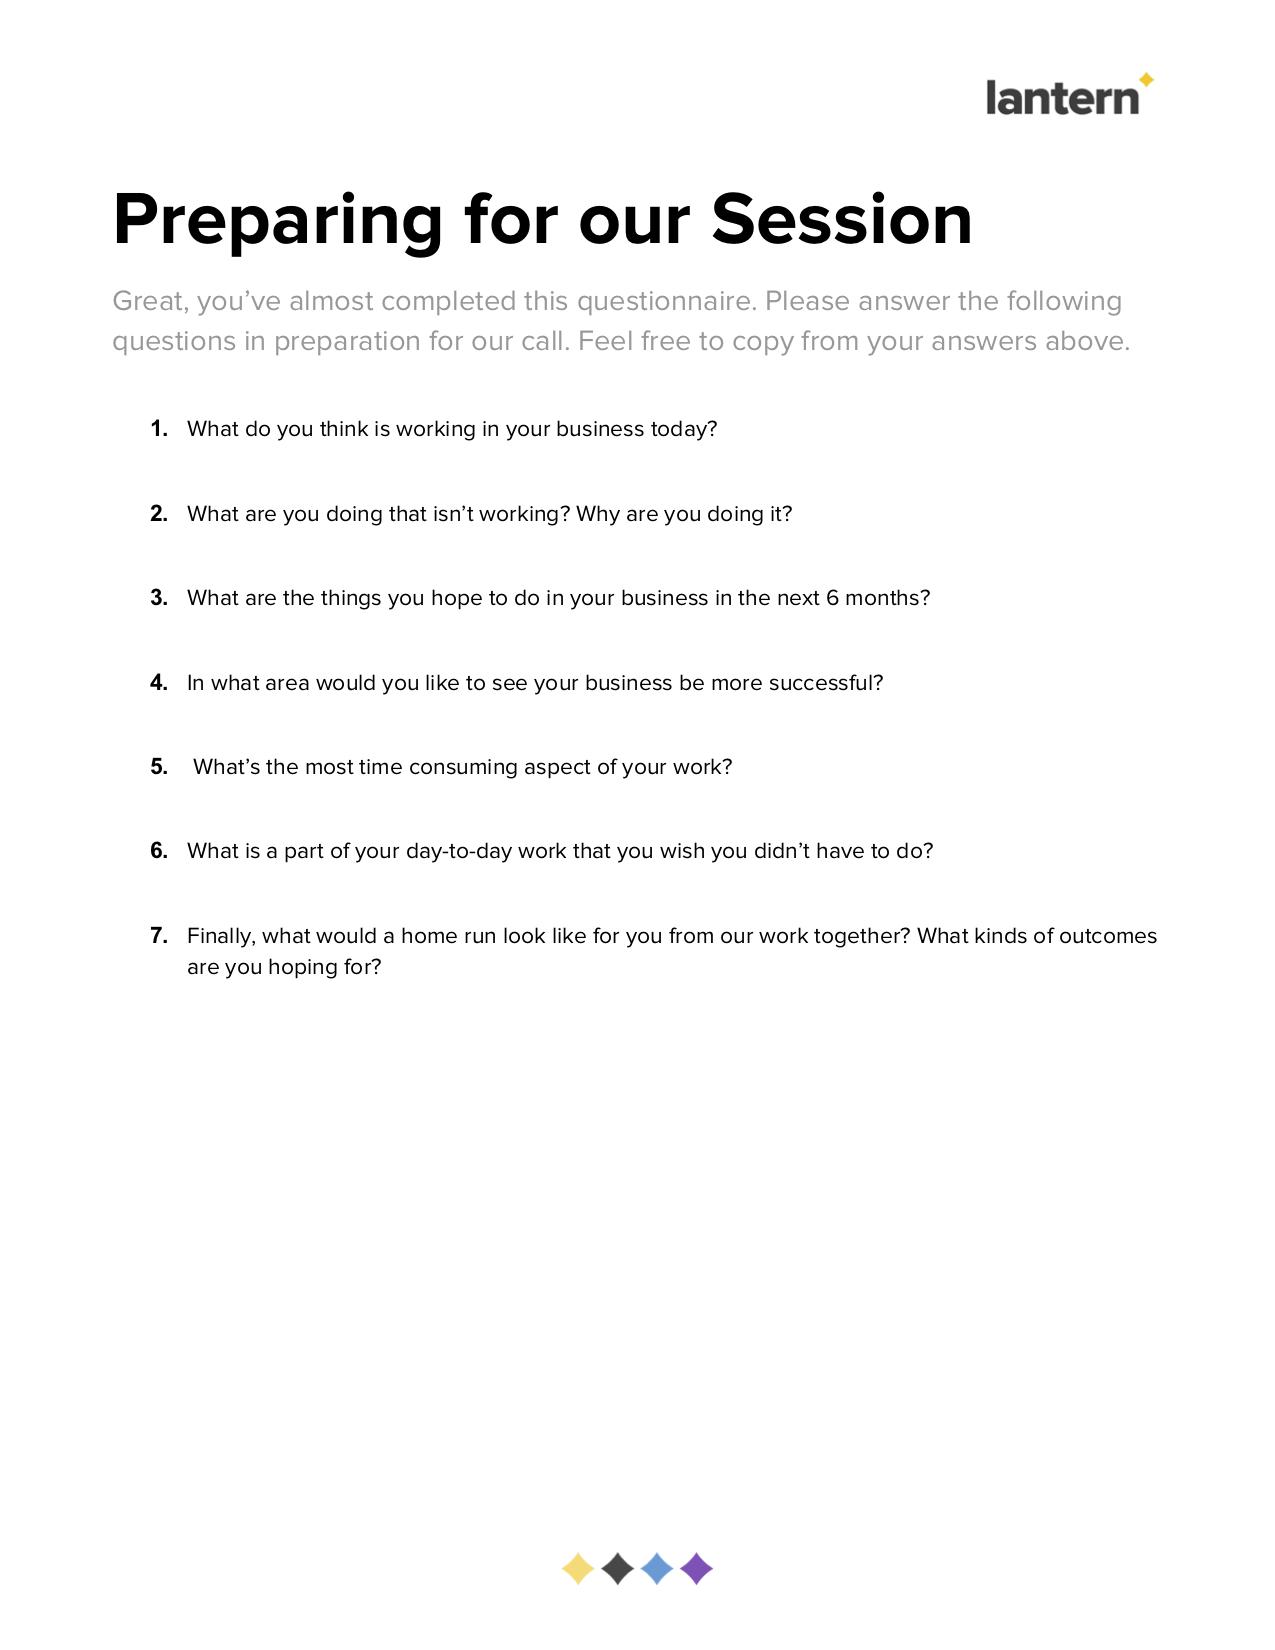 Marketing Roadmap Kickoff Questions_6.png